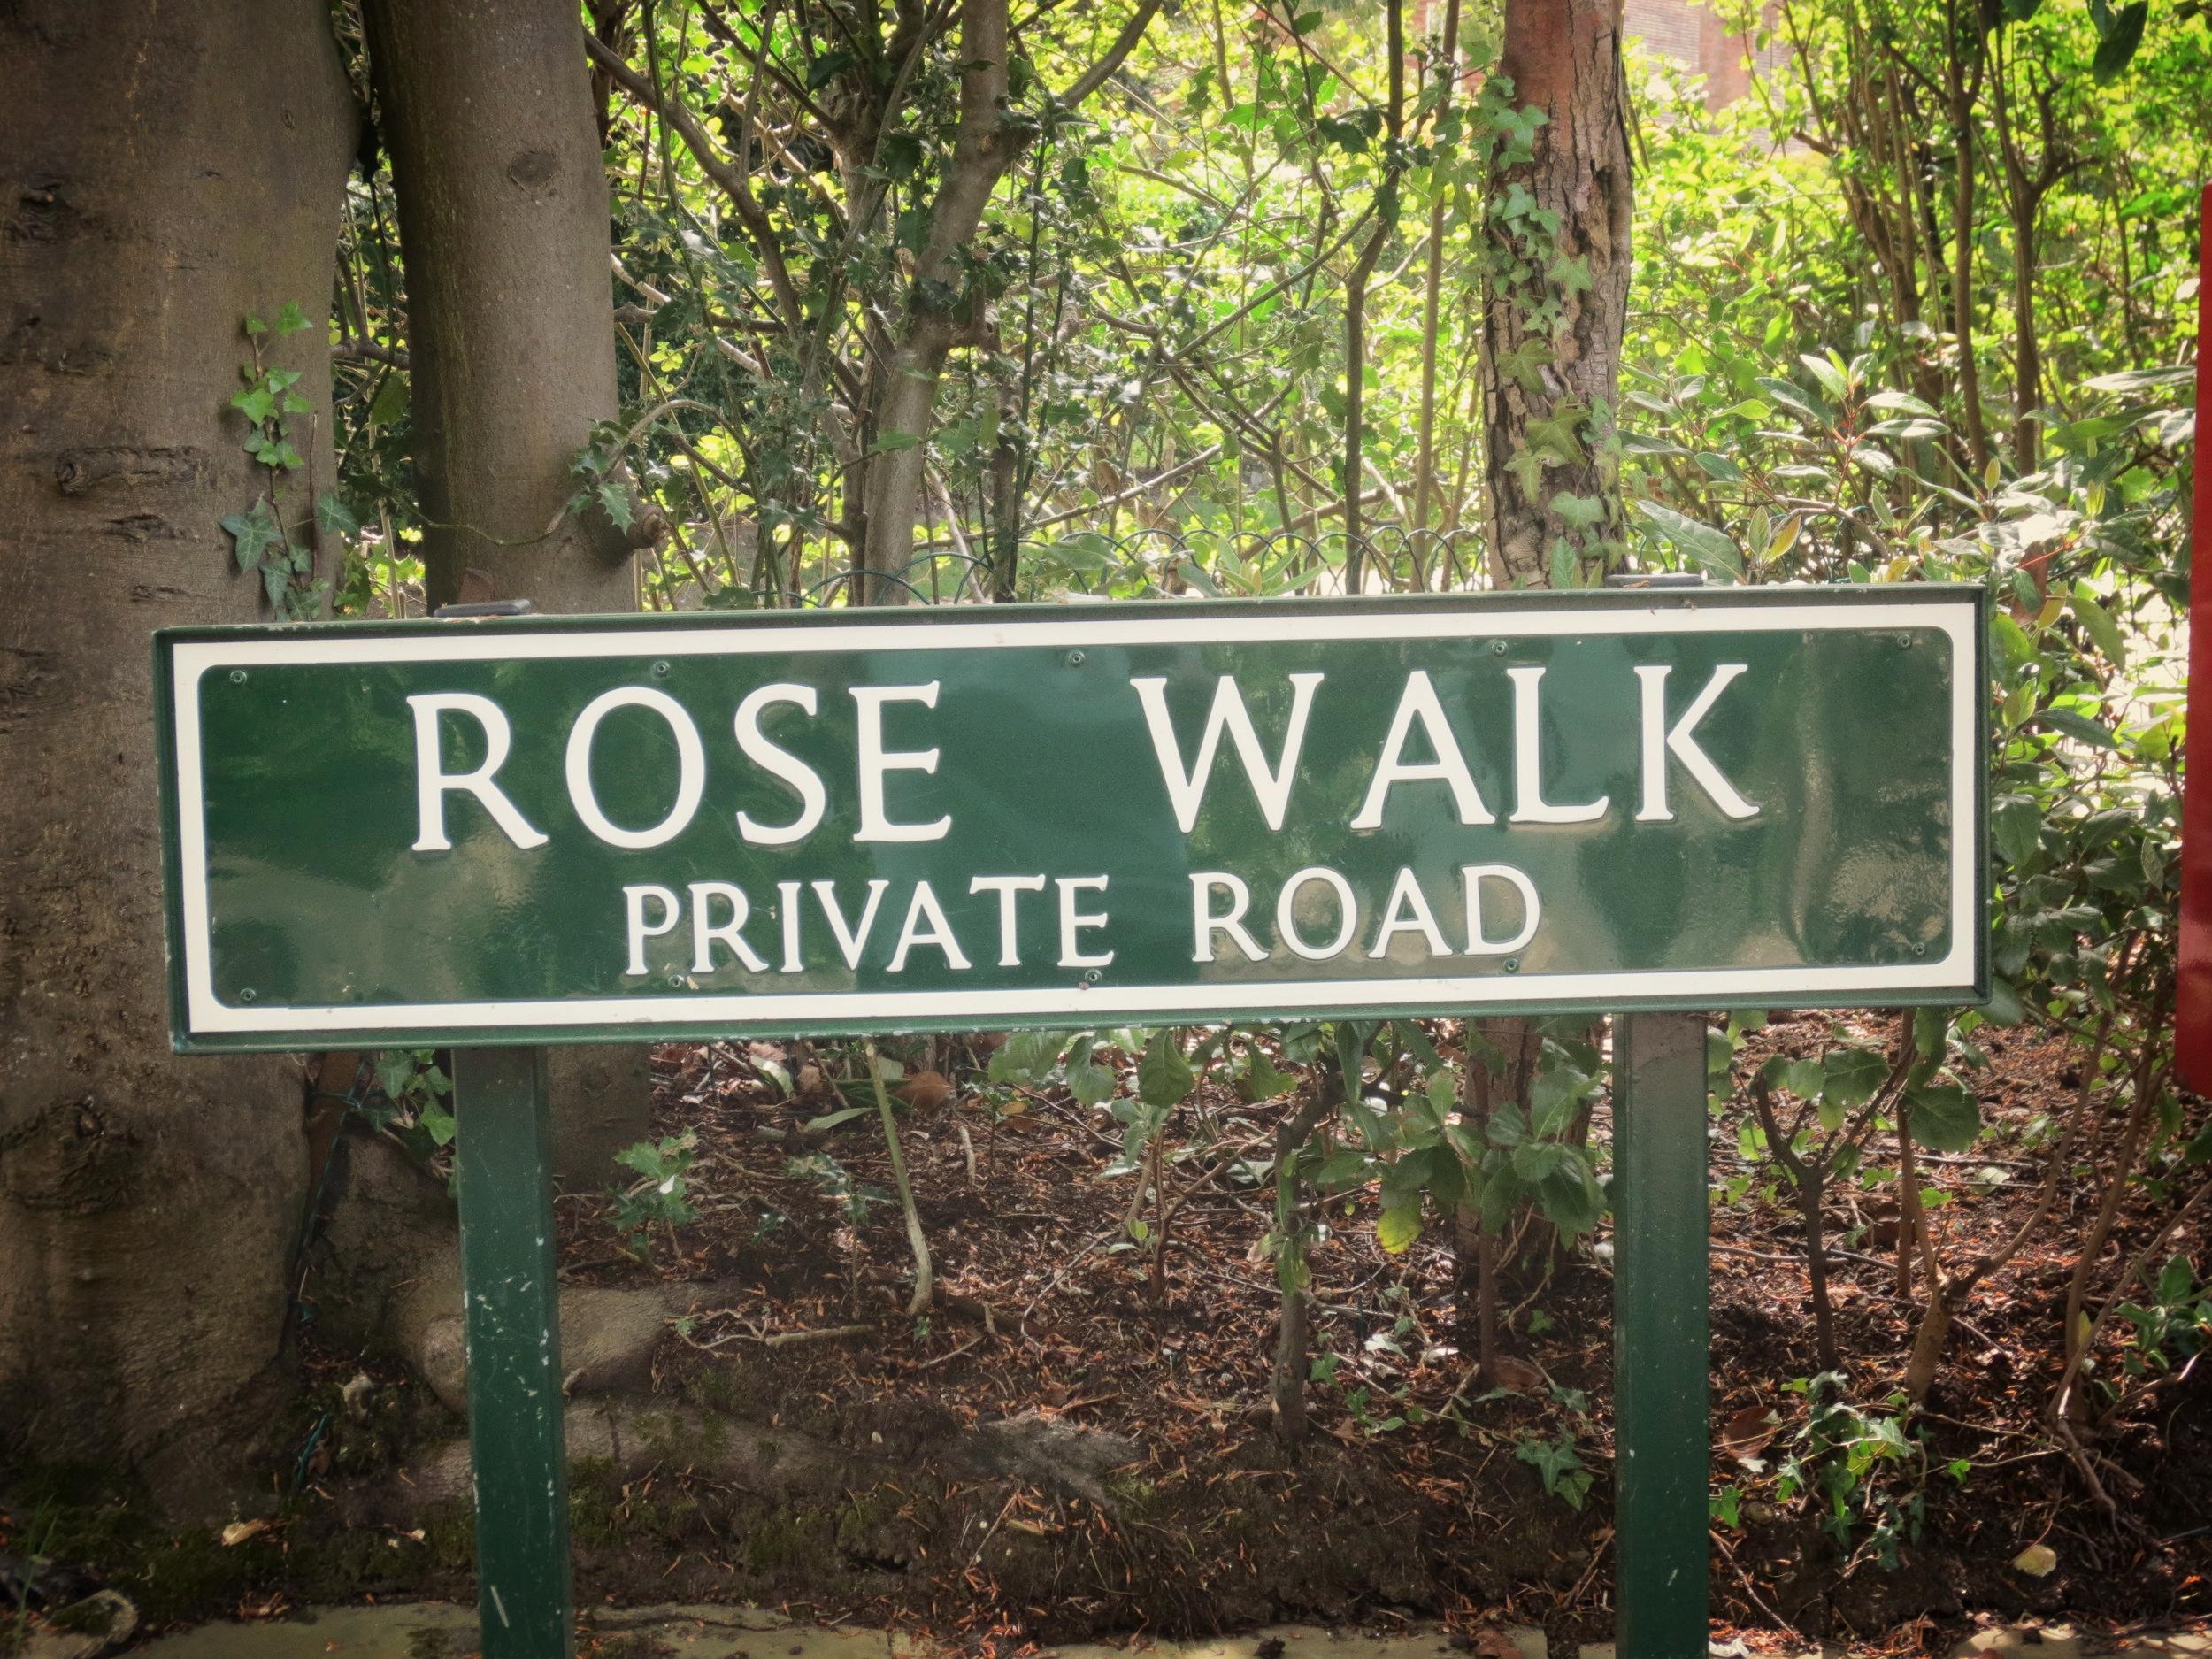 ROSE WALK